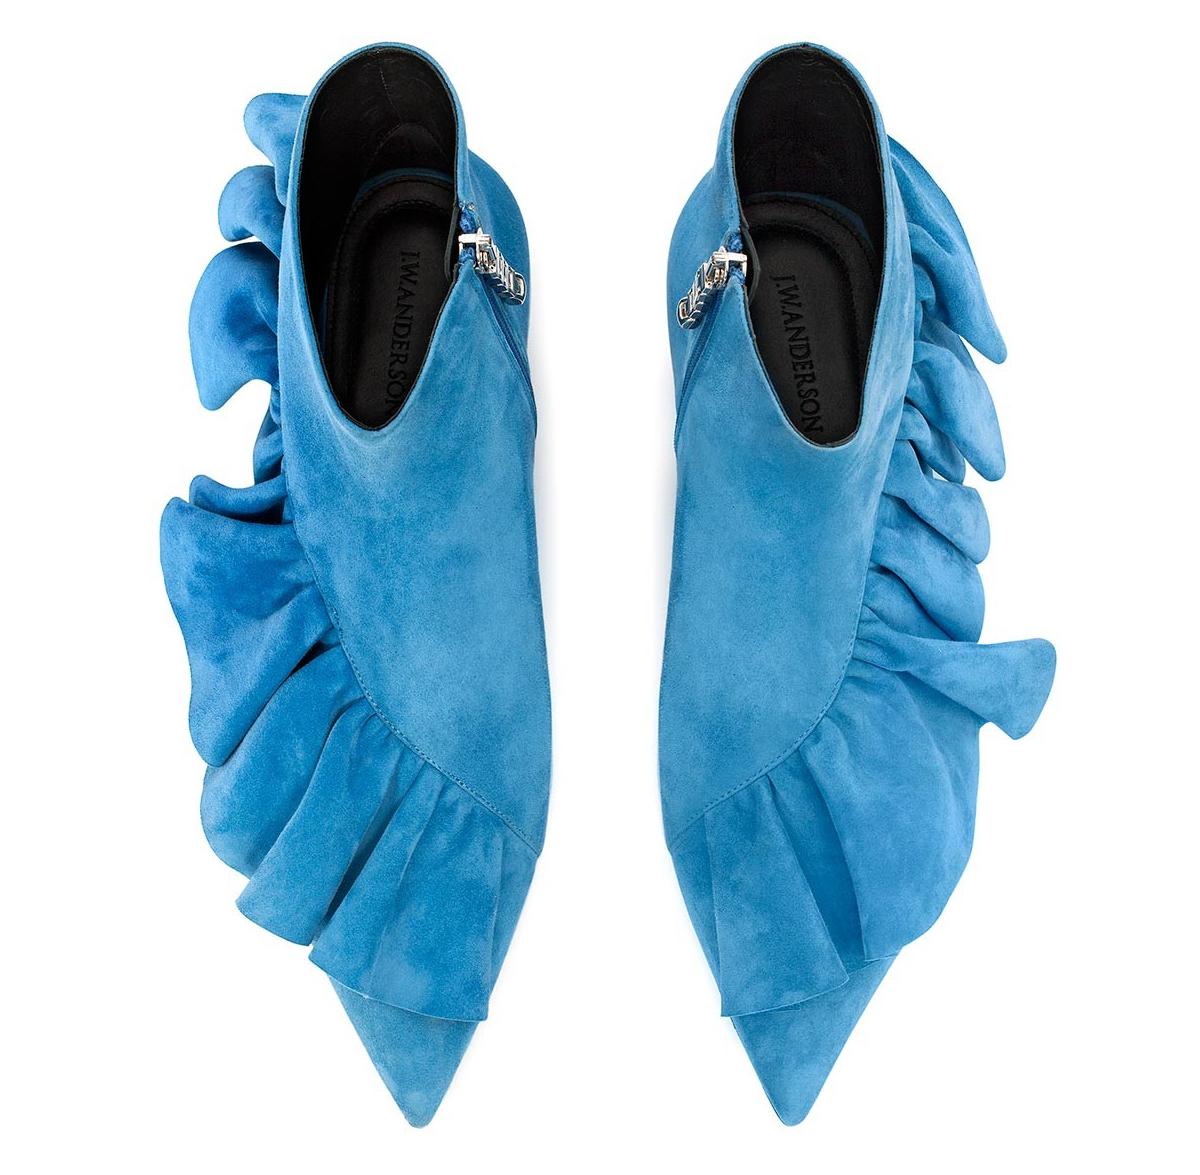 aqua-ruffle-booties-top